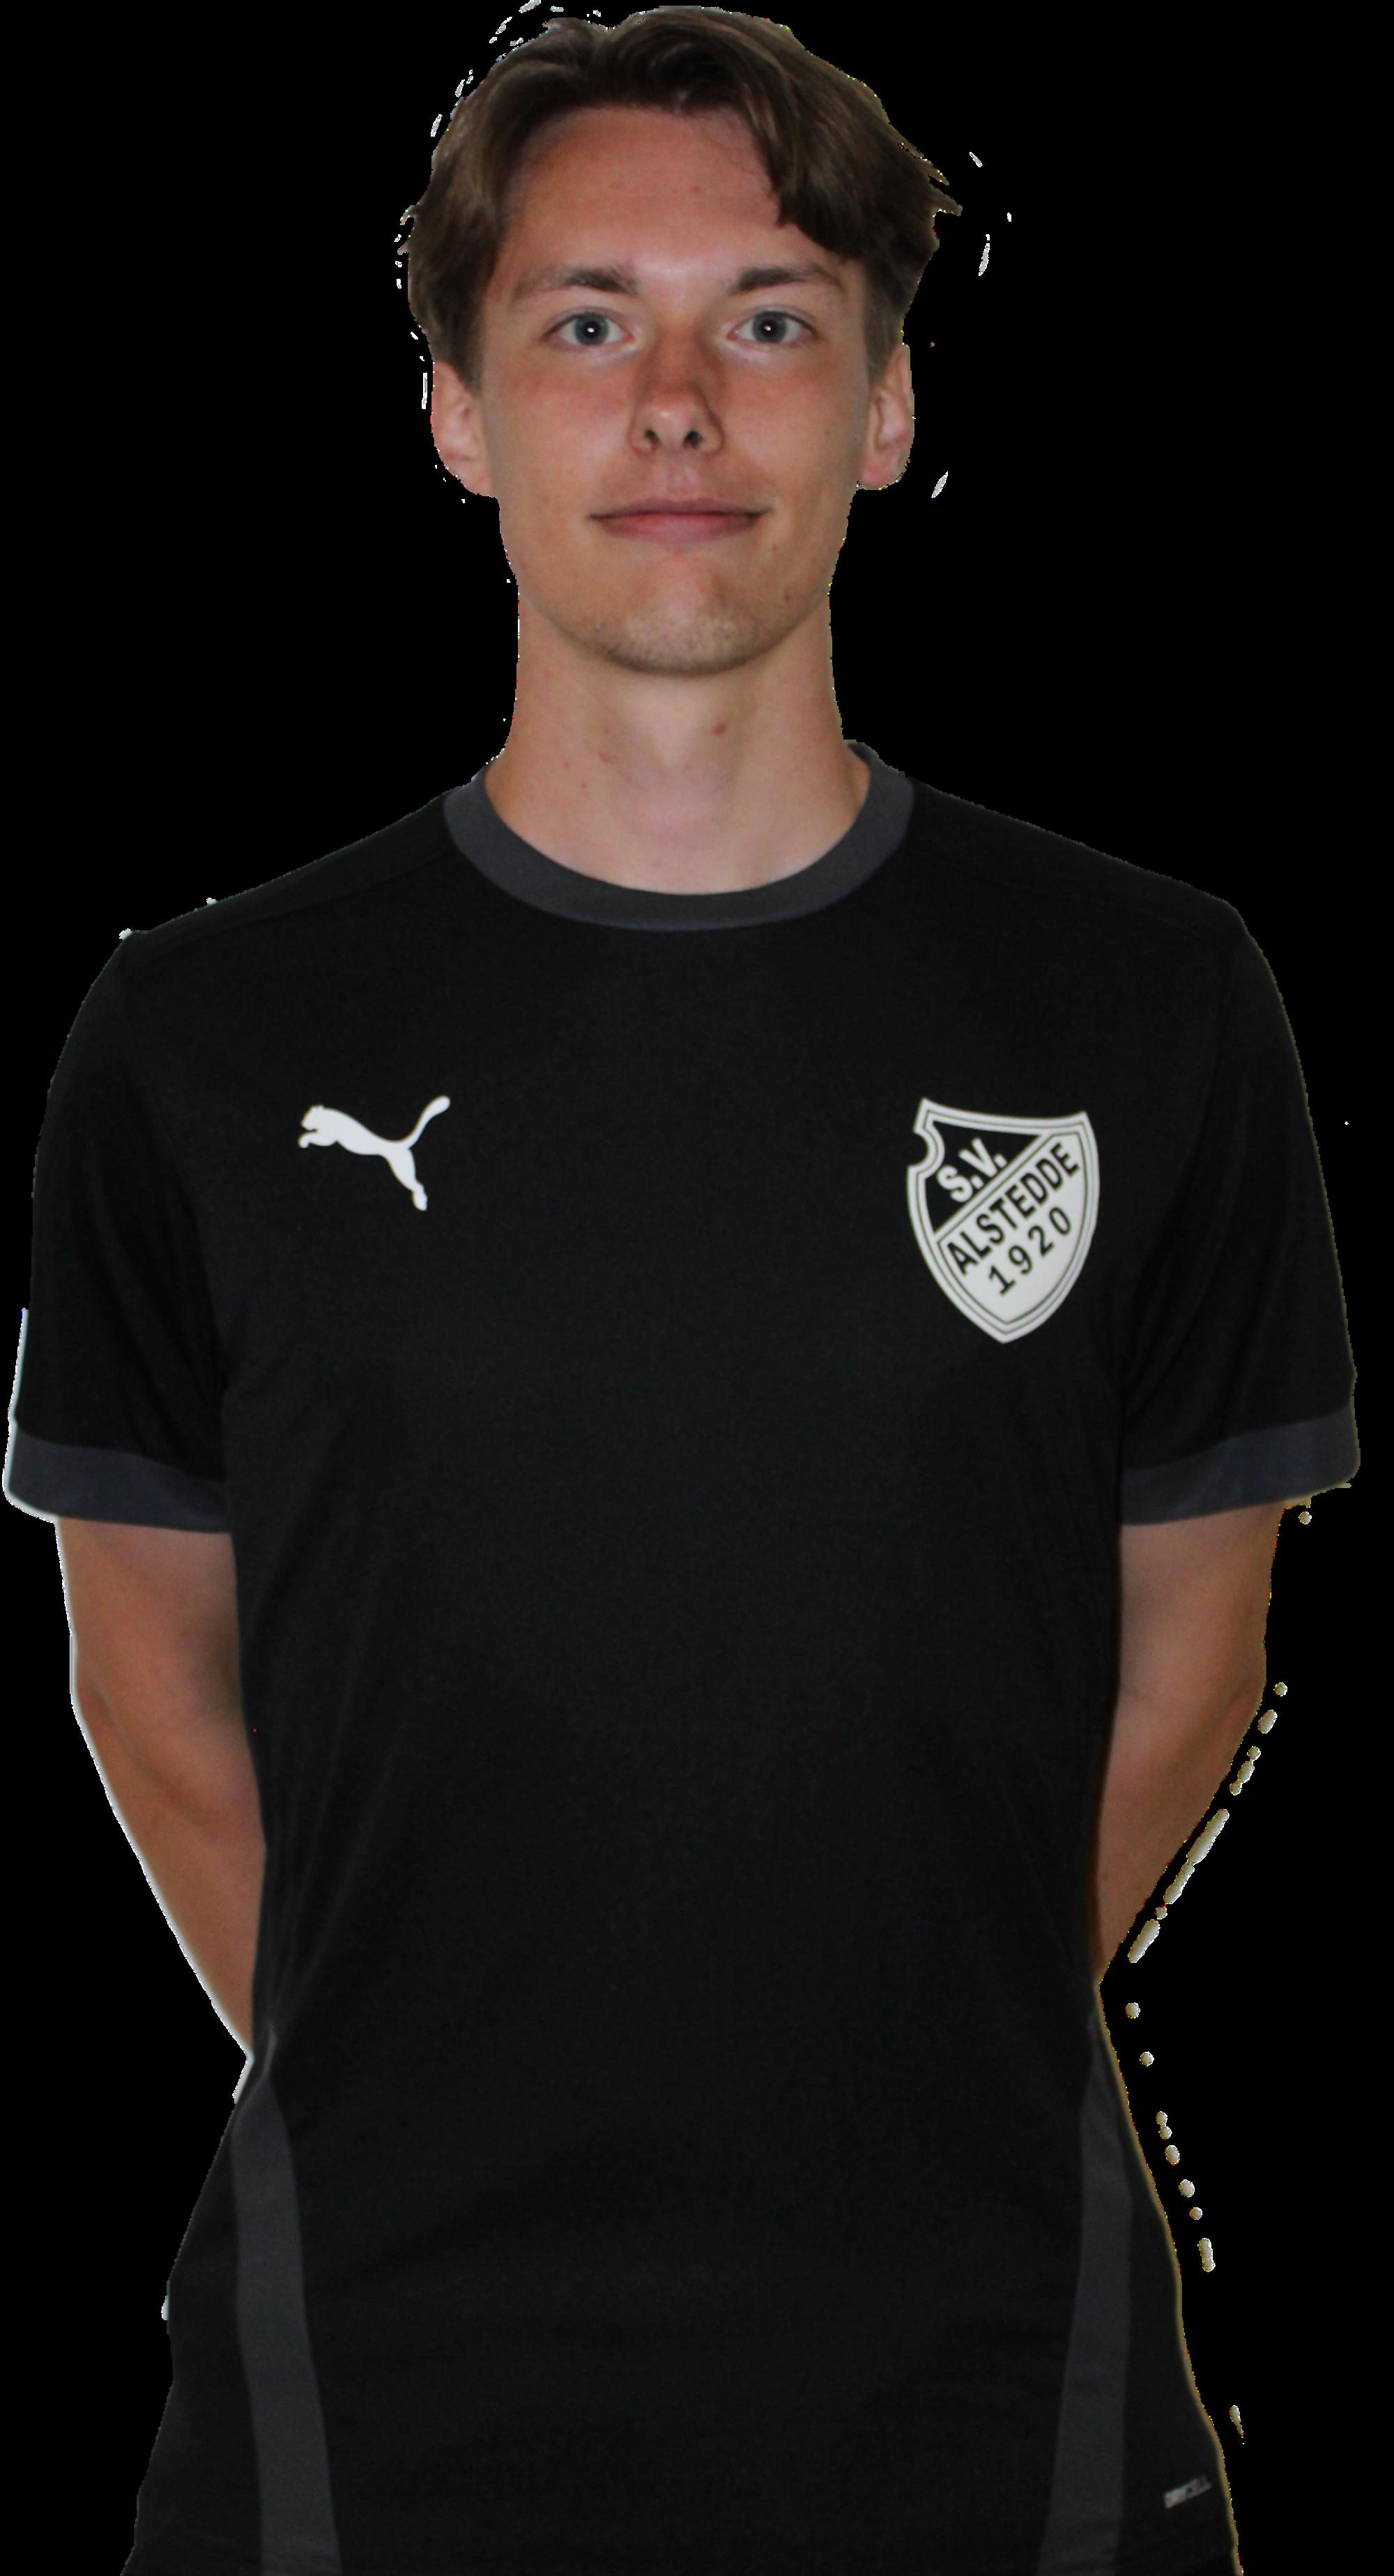 Trainer Christoph Stannies